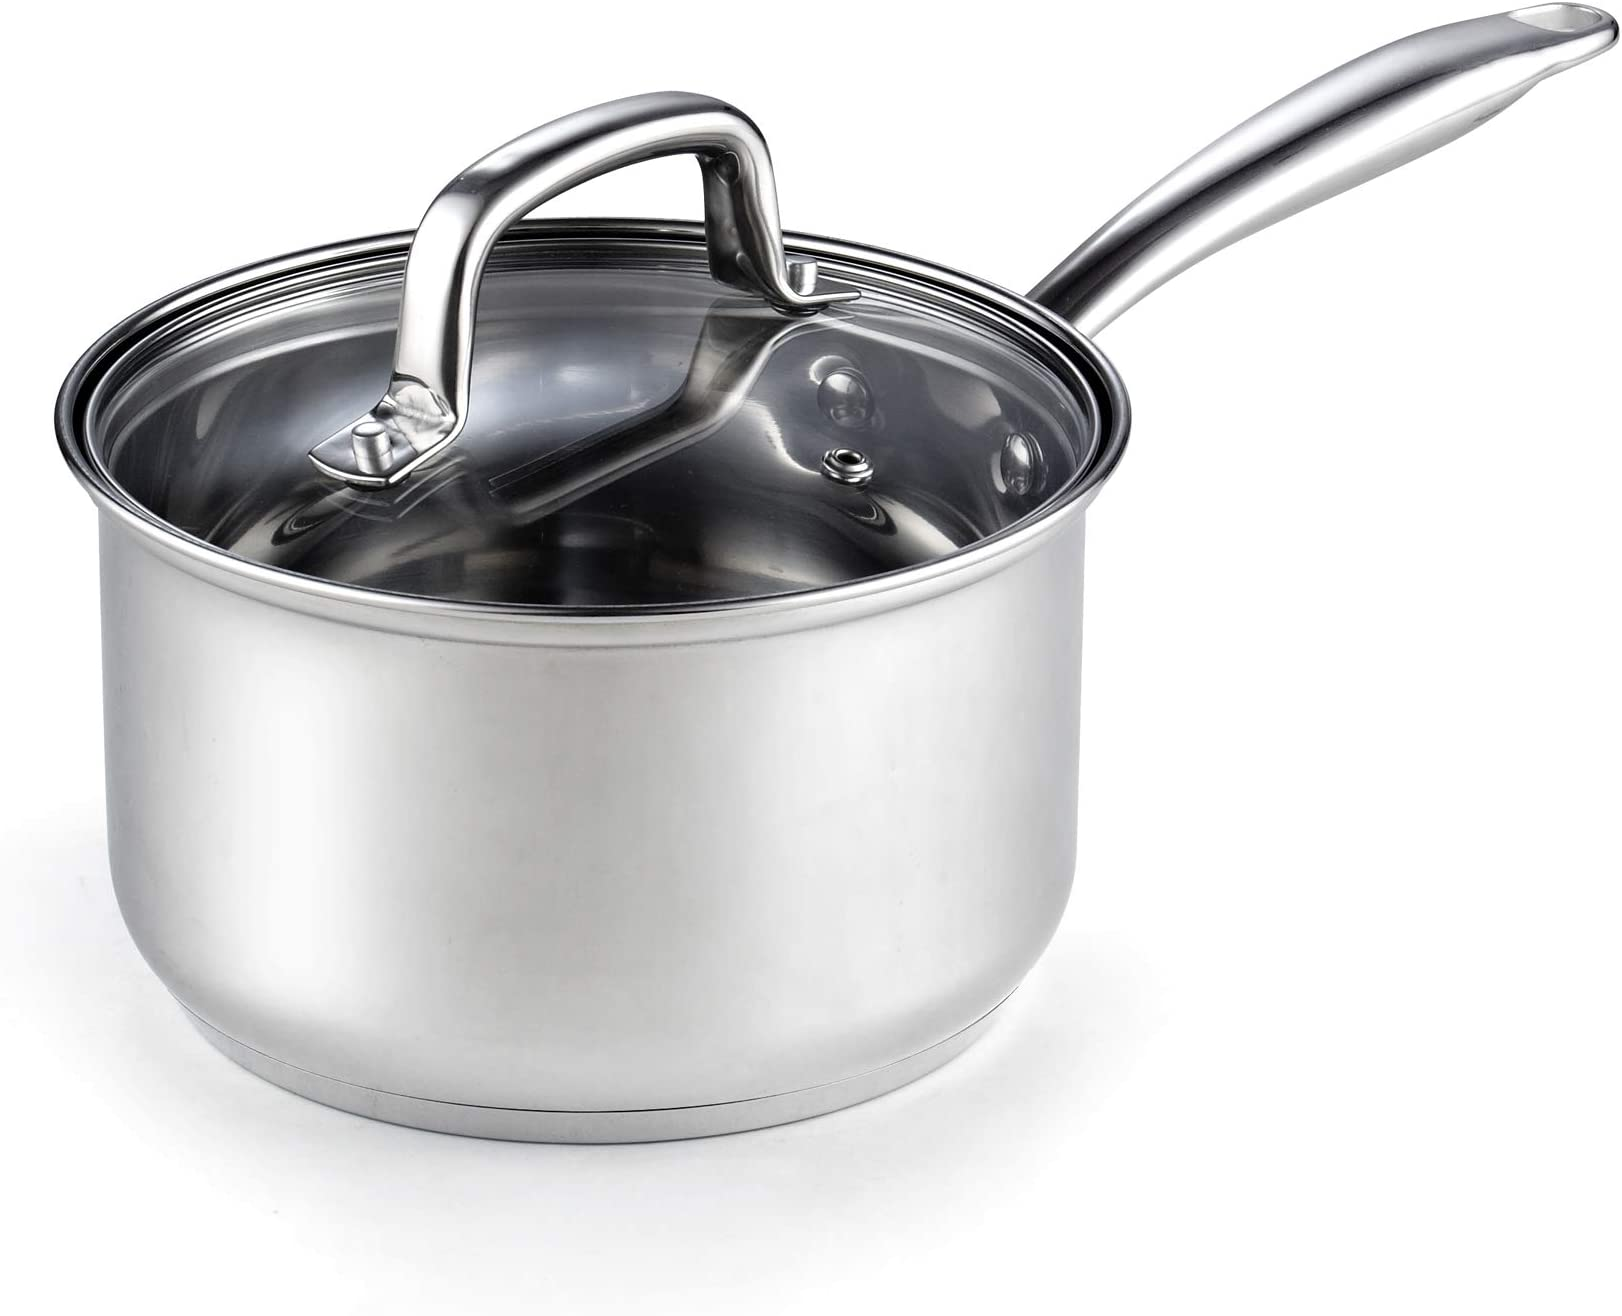 Cook N Home 2608 Lid 3-Quart Stainless Steel Saucepan, Silver